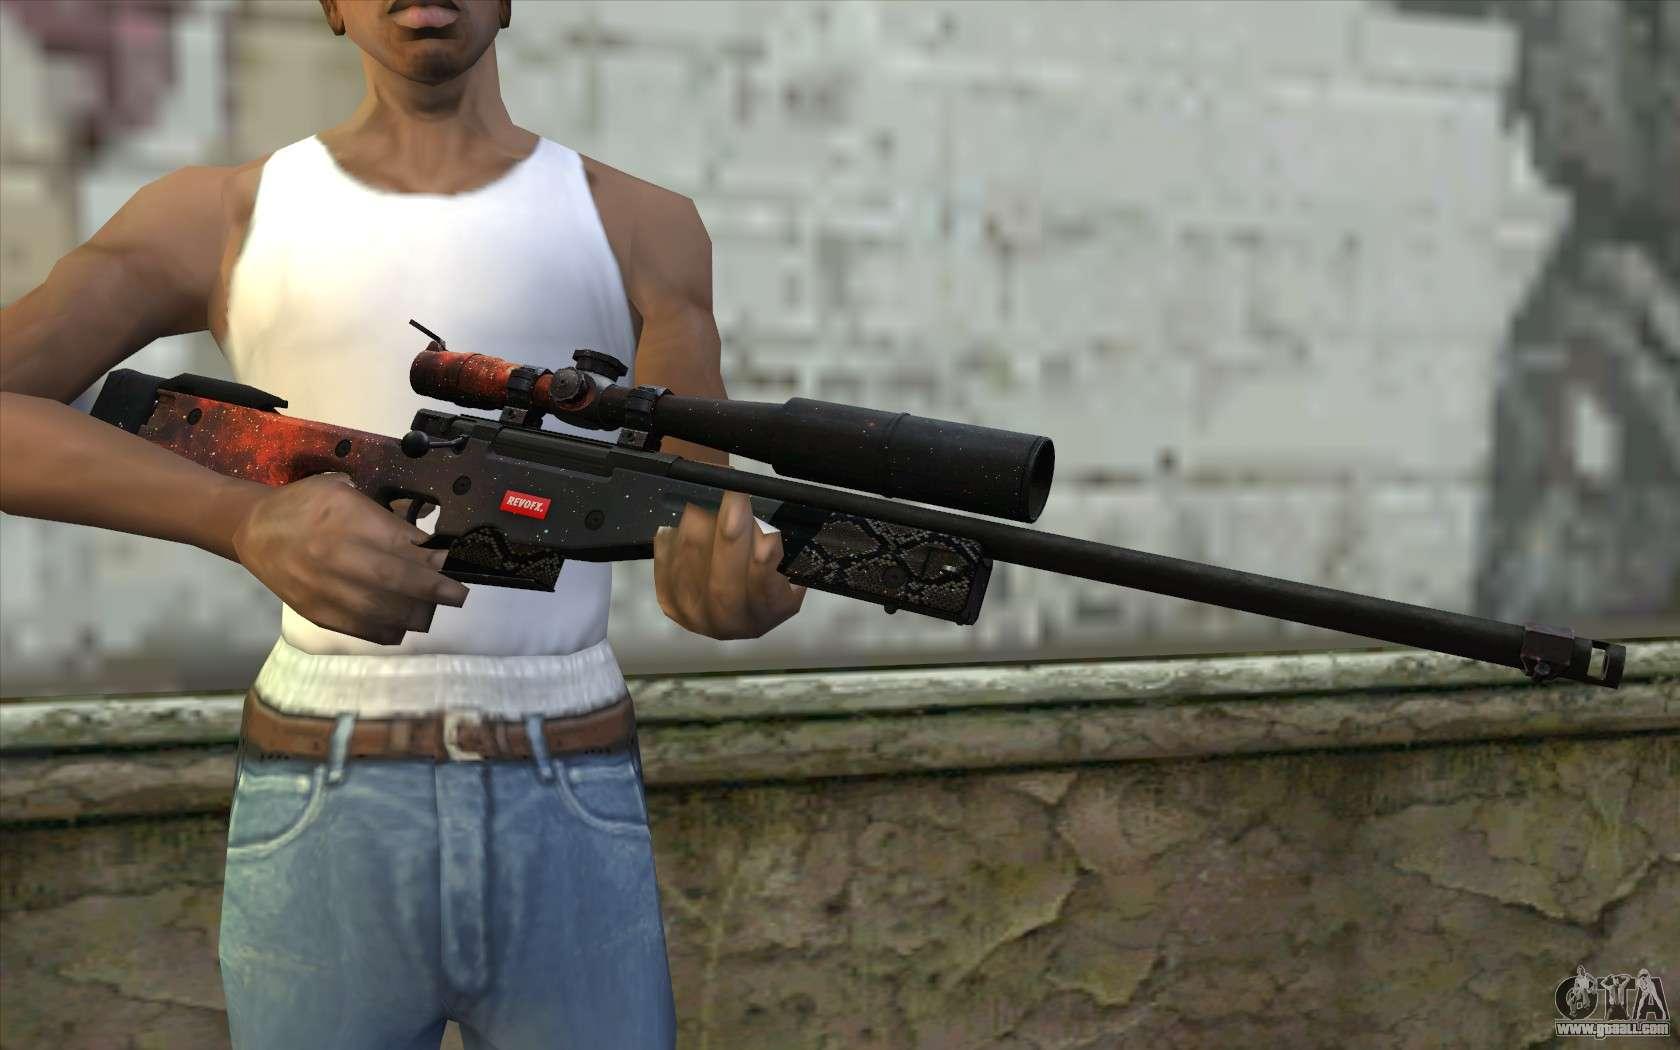 78199 Minigun Gold furthermore 64743 M14 Assault Rifle moreover 37689 Bazooka as well Harley Quinn 649032086 together with Batman 1966 1968. on original bat phone